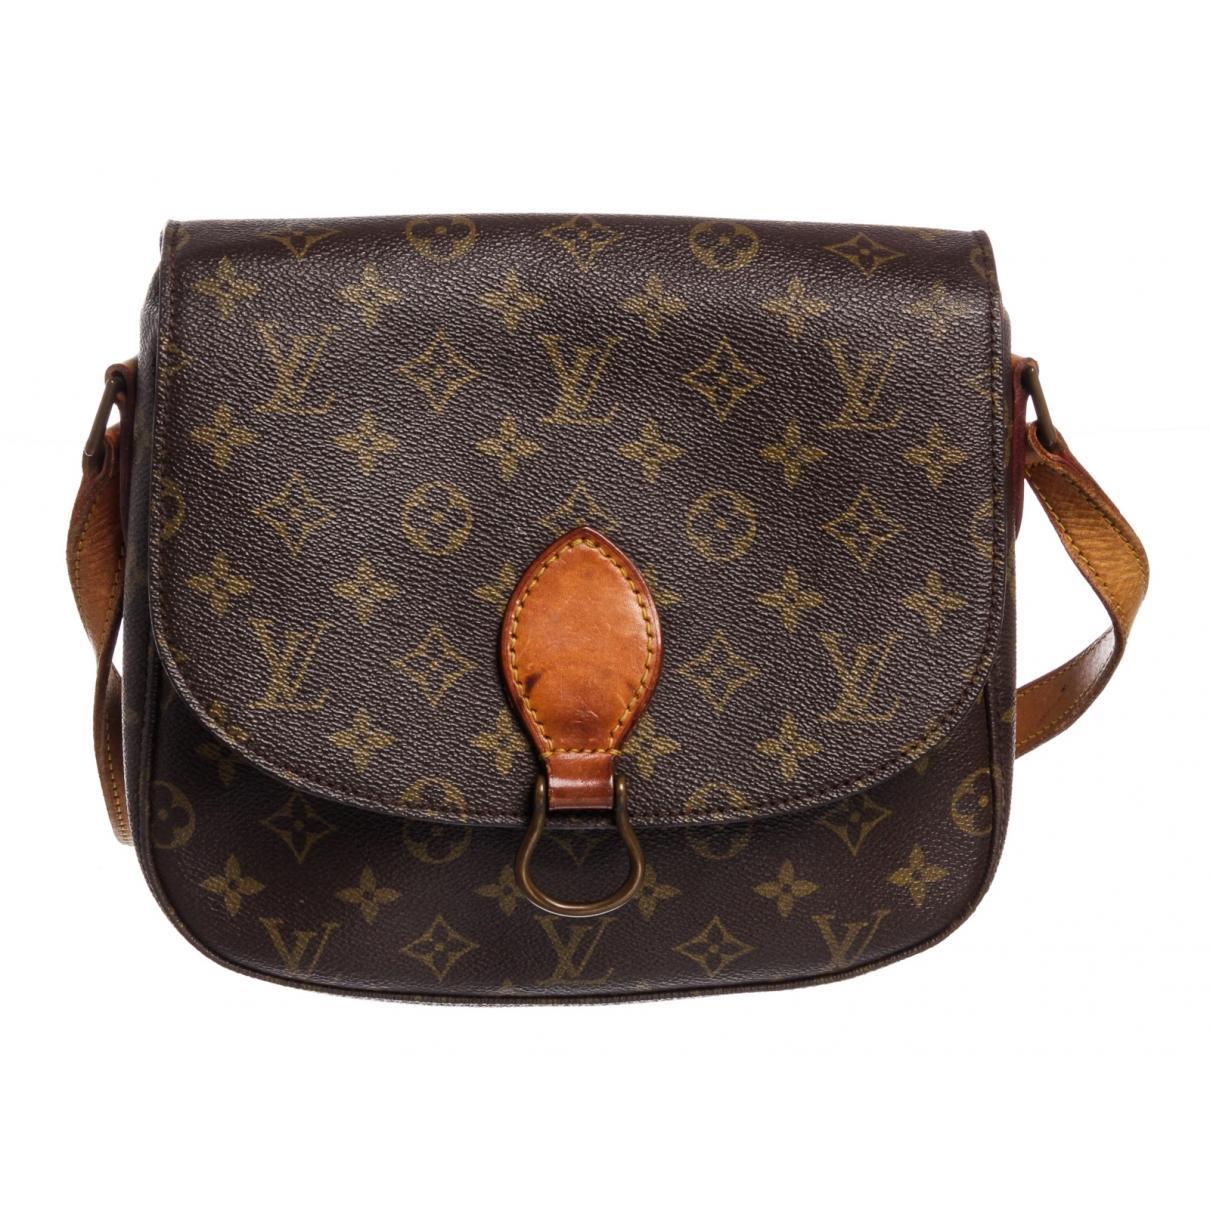 d7124c7ee79d Lyst - Louis Vuitton Pre-owned Saint Cloud Brown Cloth Handbags in Brown